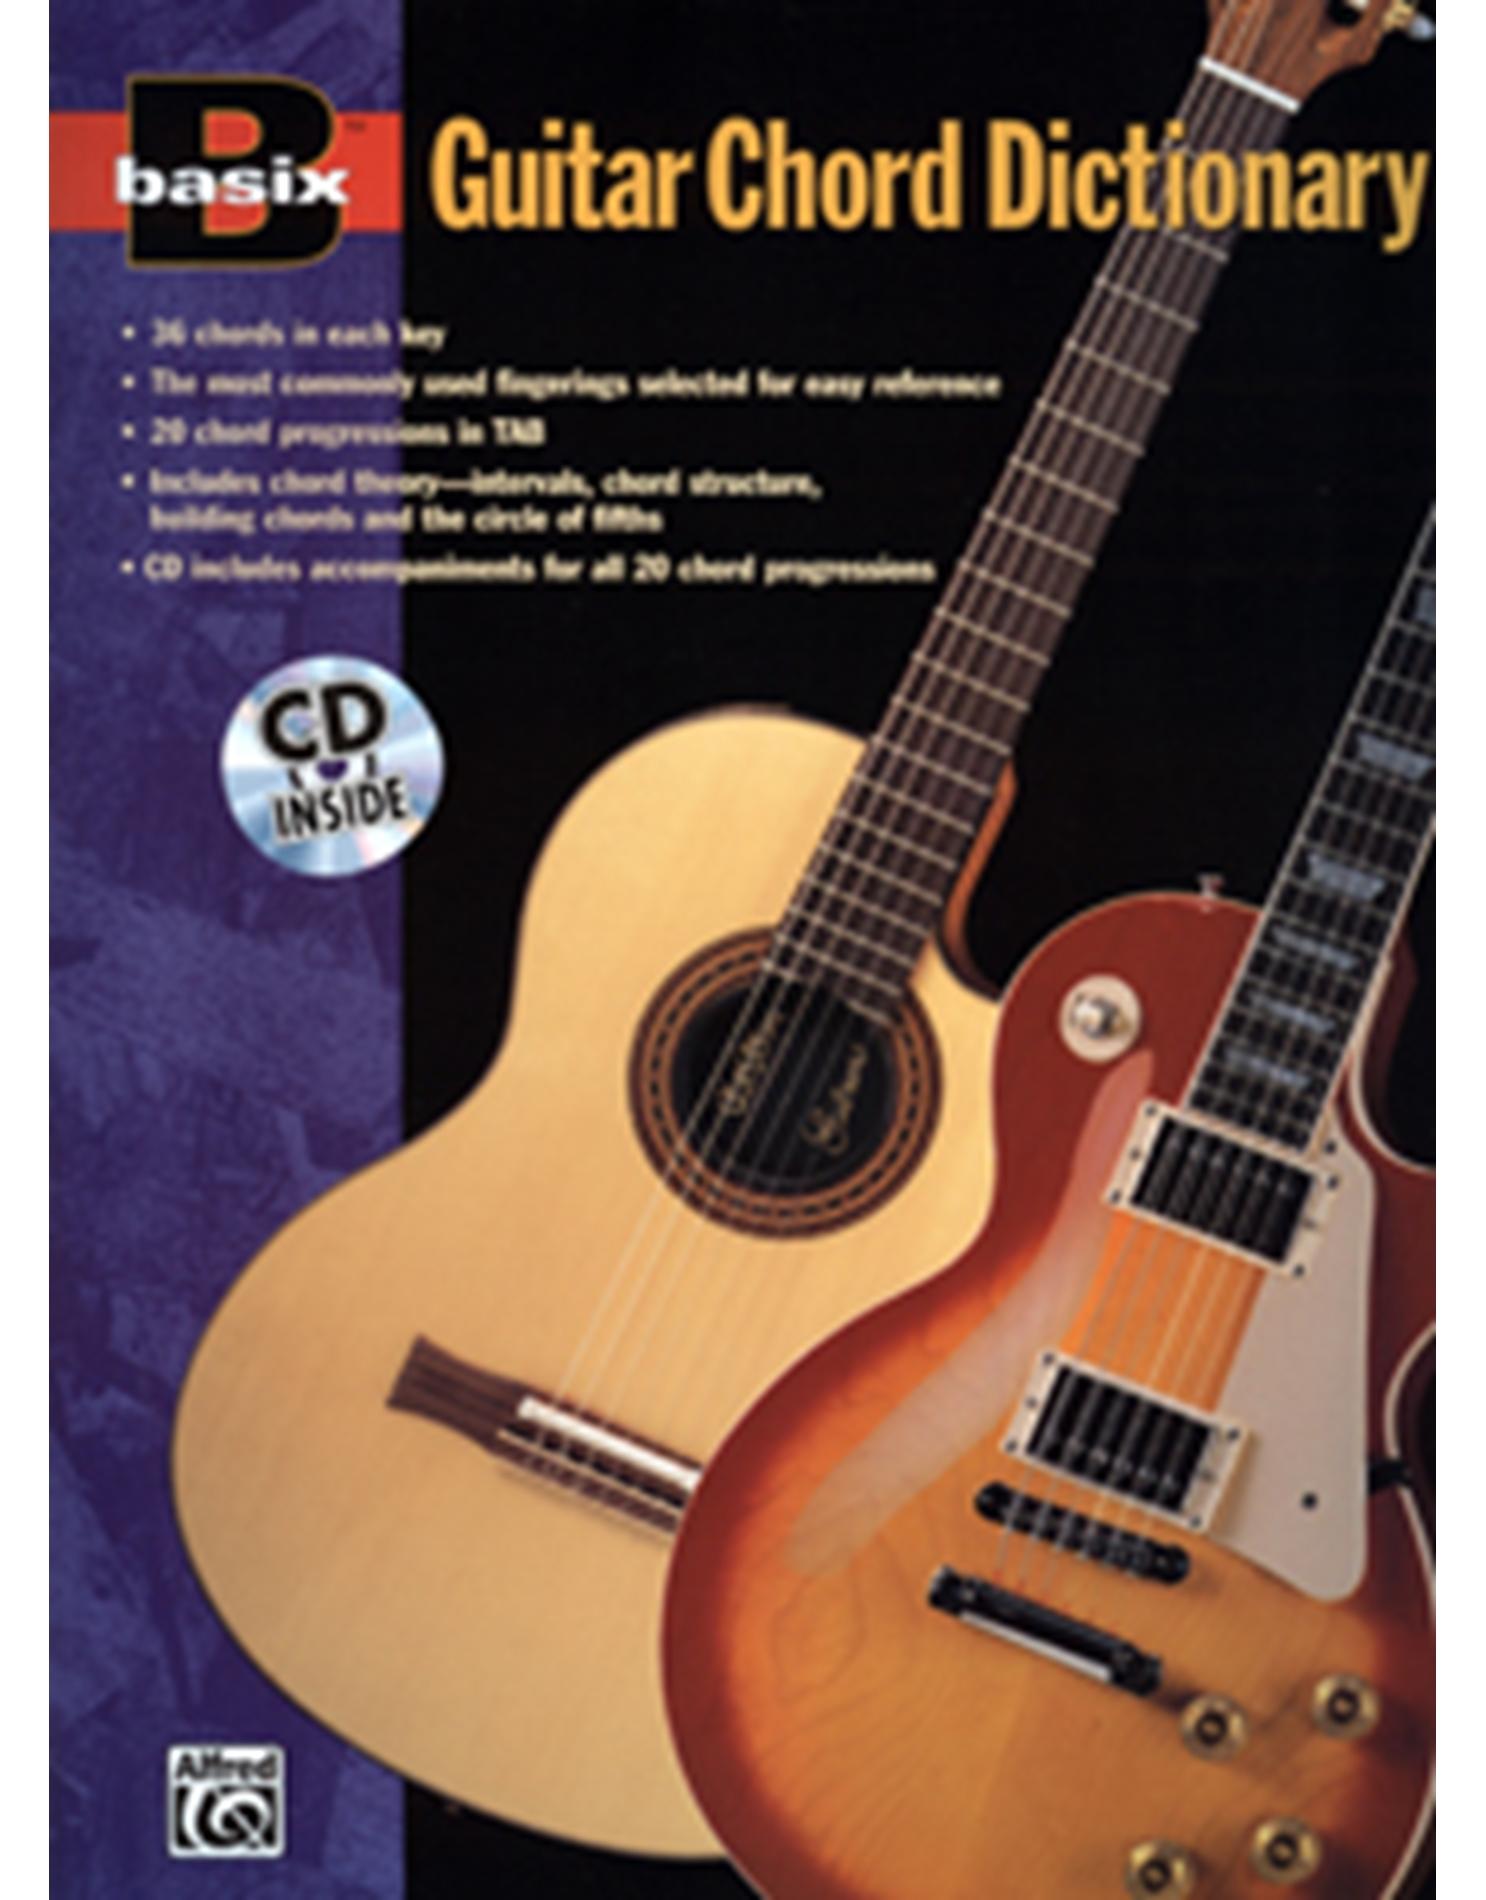 Basix Guitar Chord Dictionary + CD